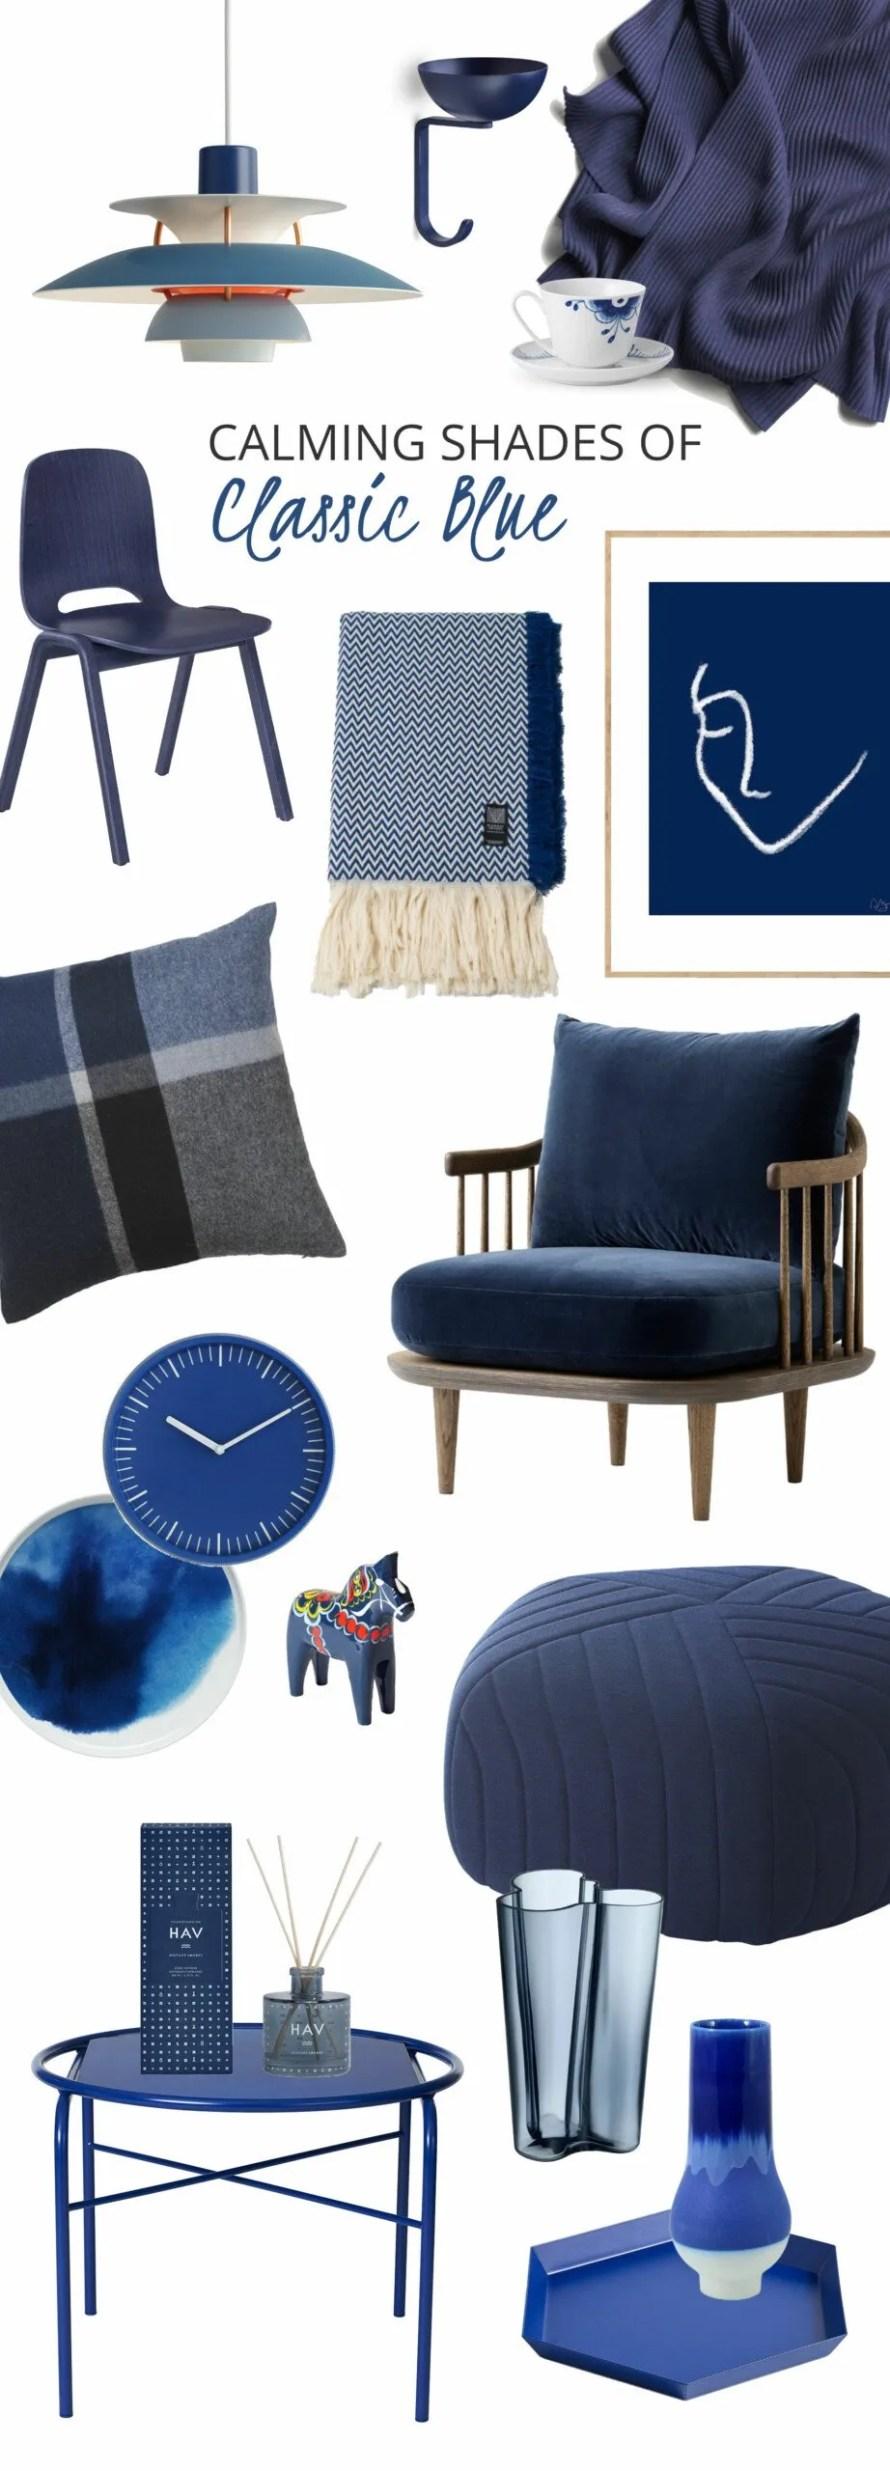 scandinavian feeling classic blue pantone 2020 scaled